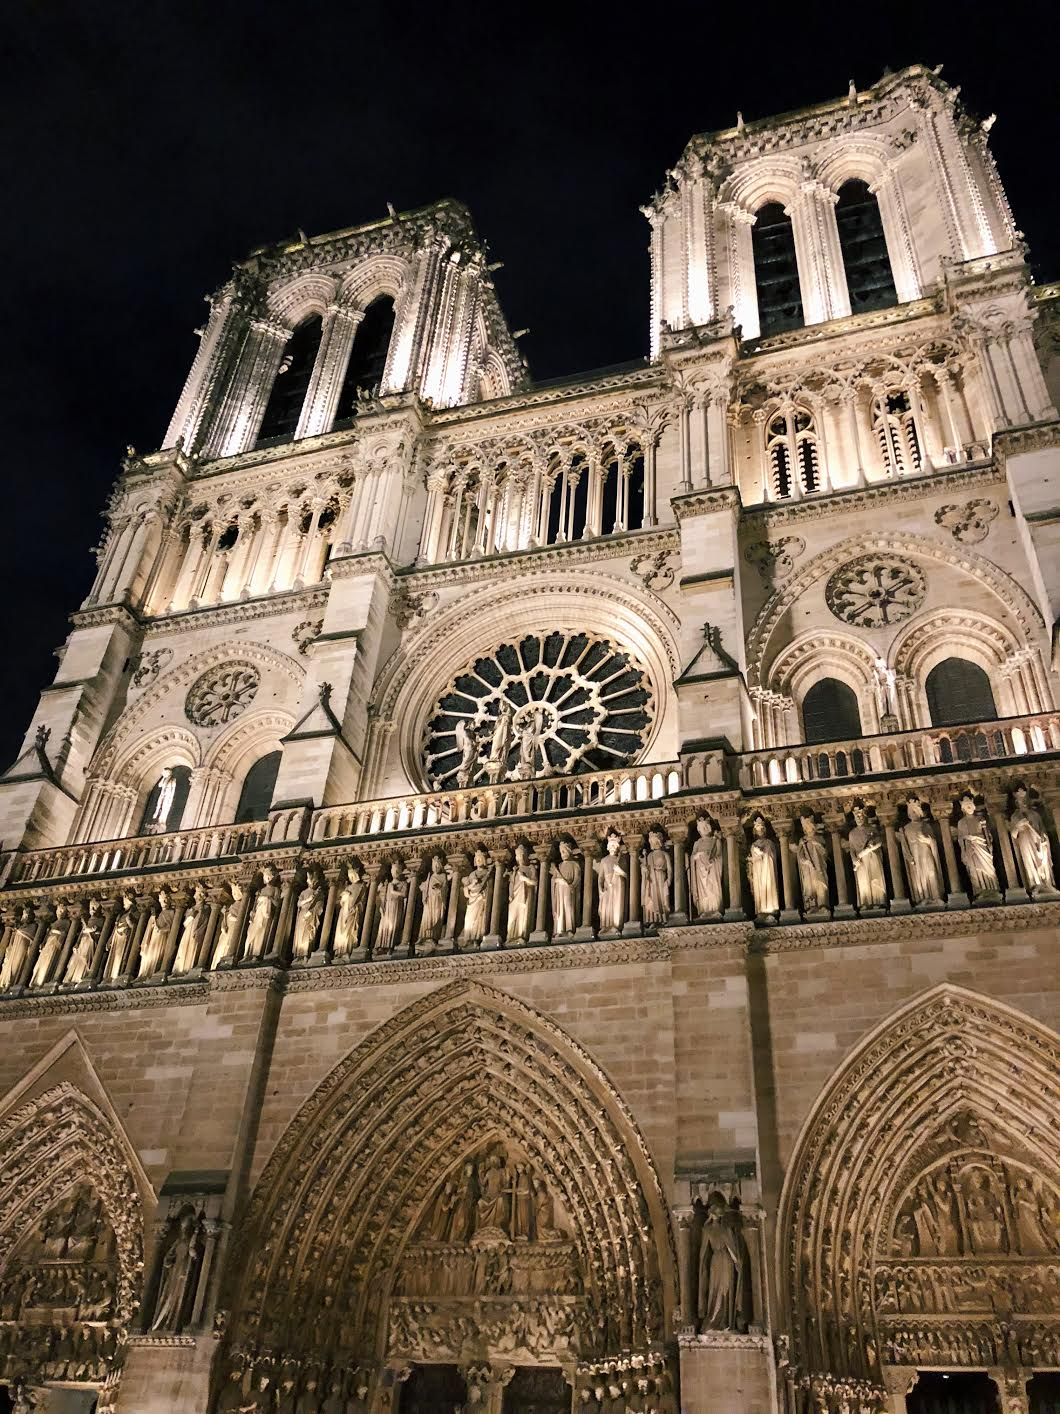 Muslim-travel-guide-Paris-Notre-Dame-Cathedral-exterior.jpg